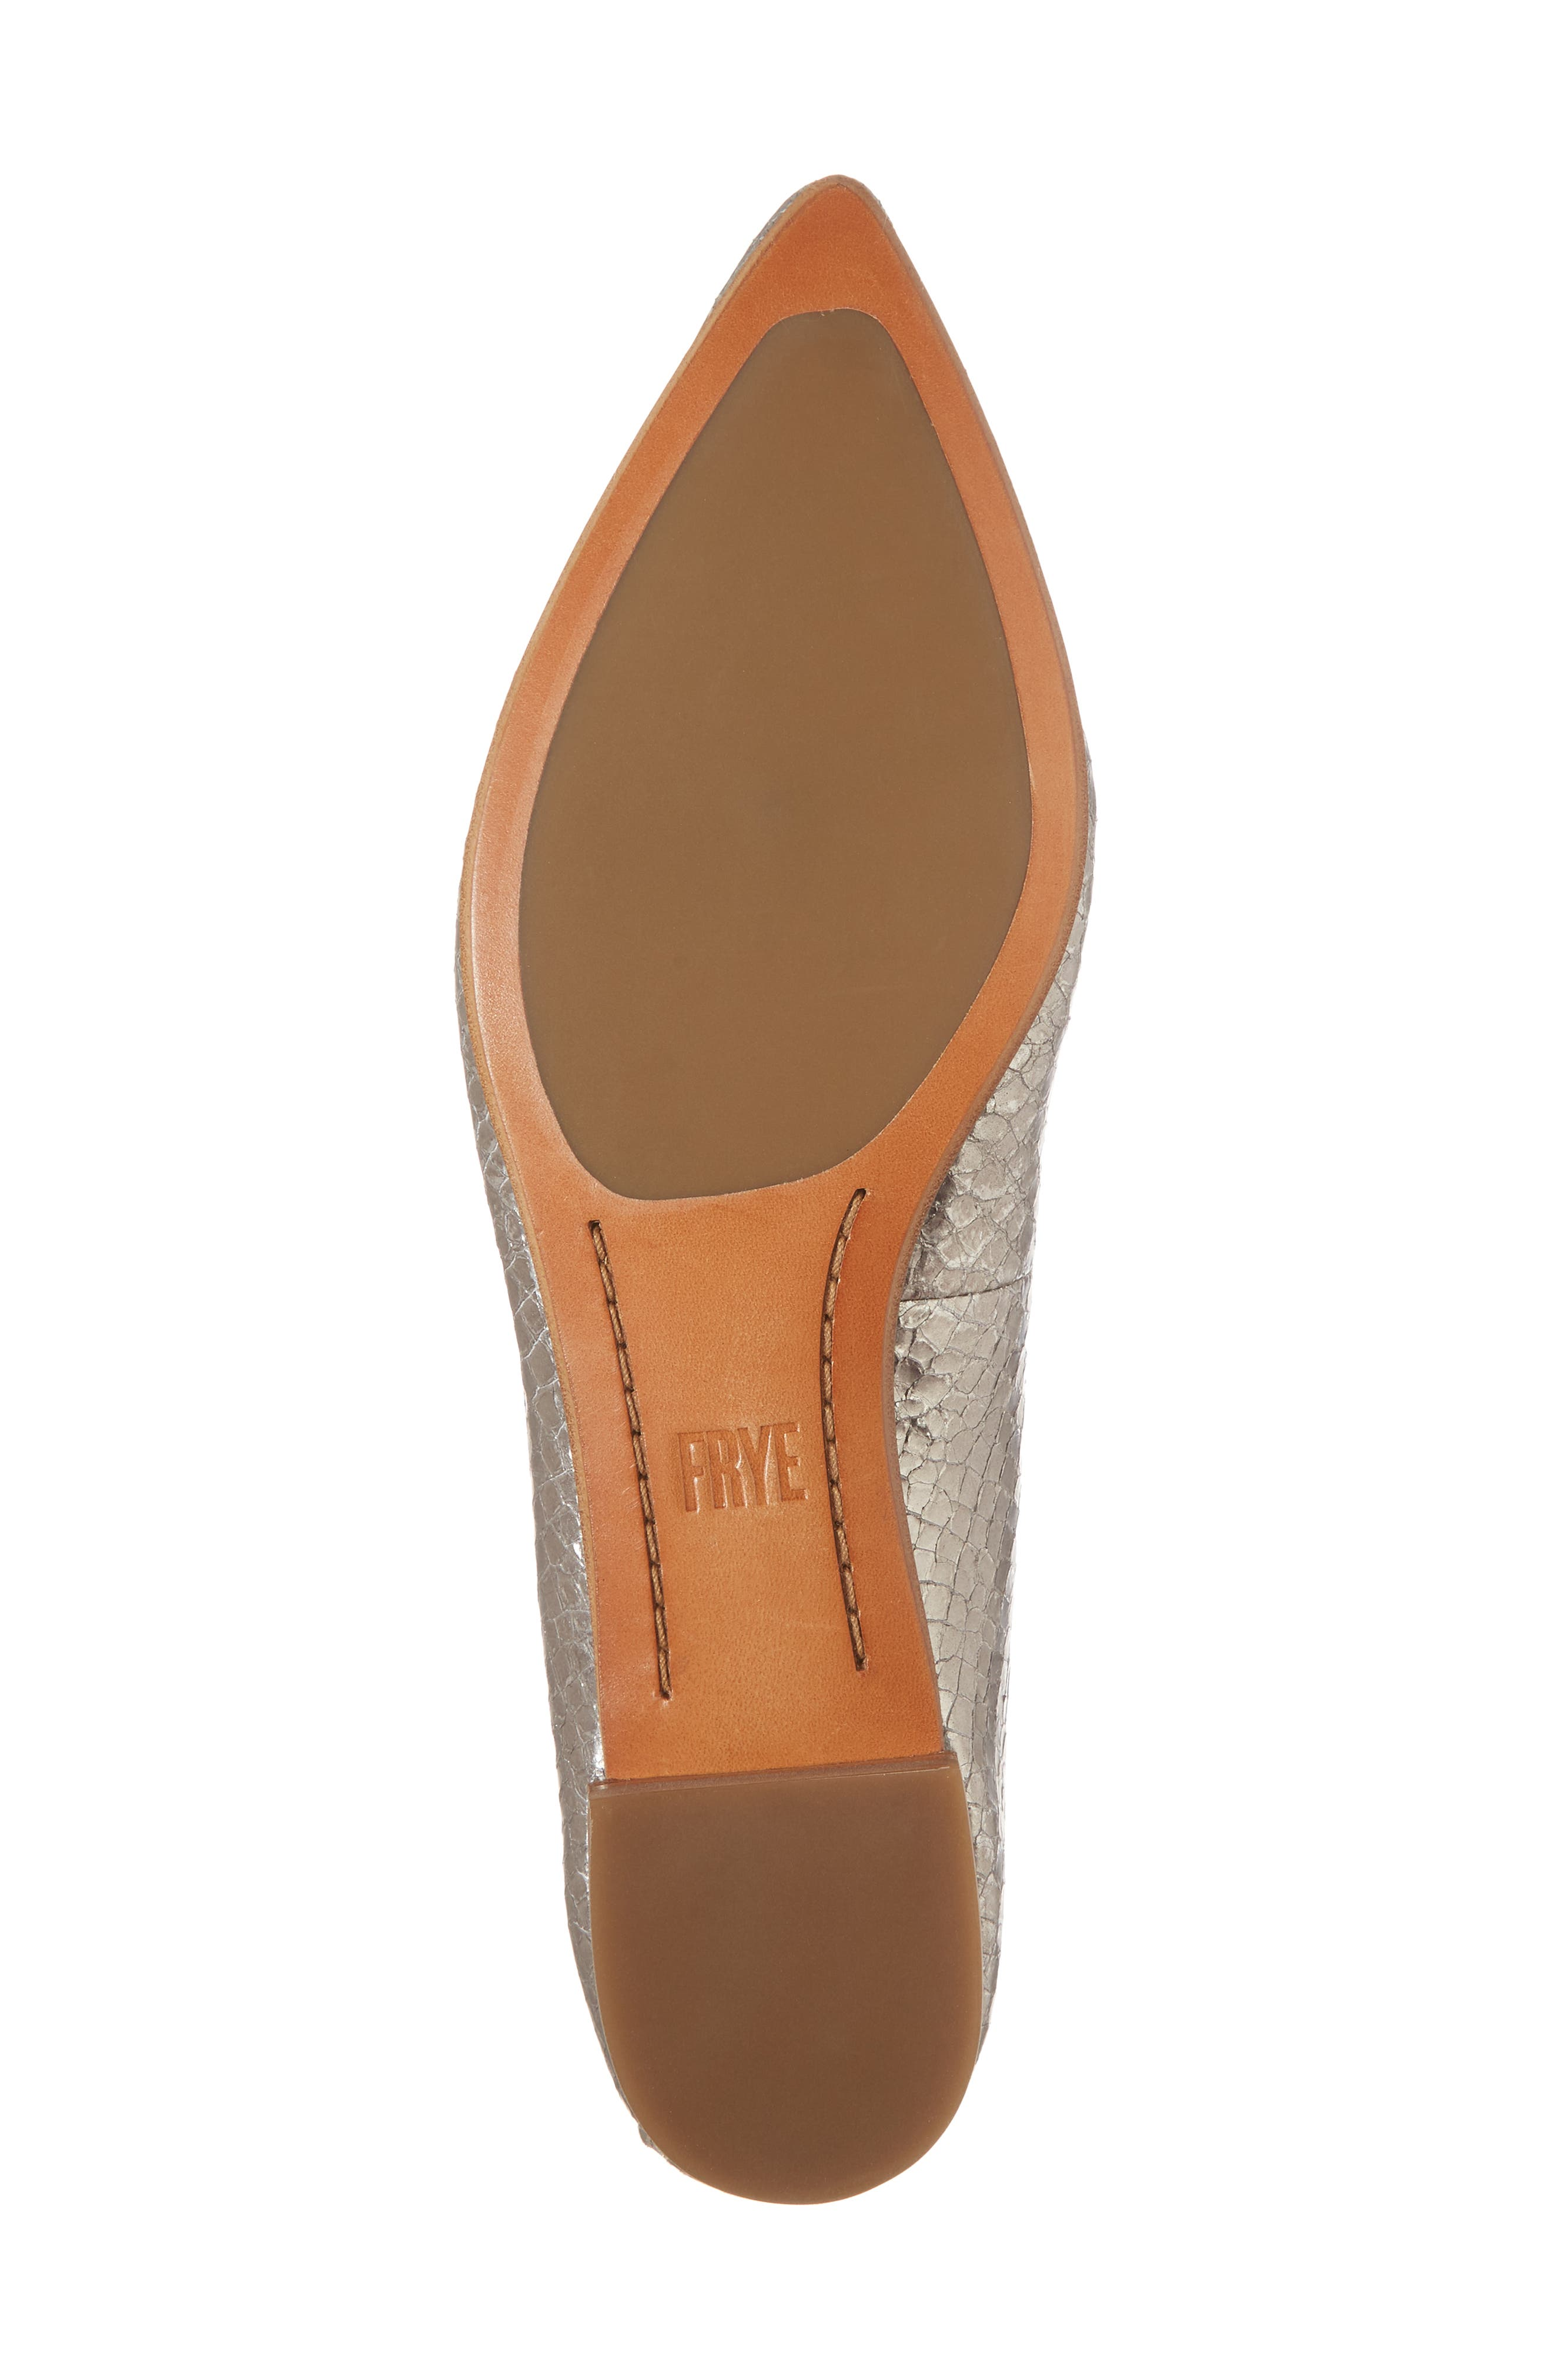 Sienna Pointy Toe Ballet Flat,                             Alternate thumbnail 16, color,